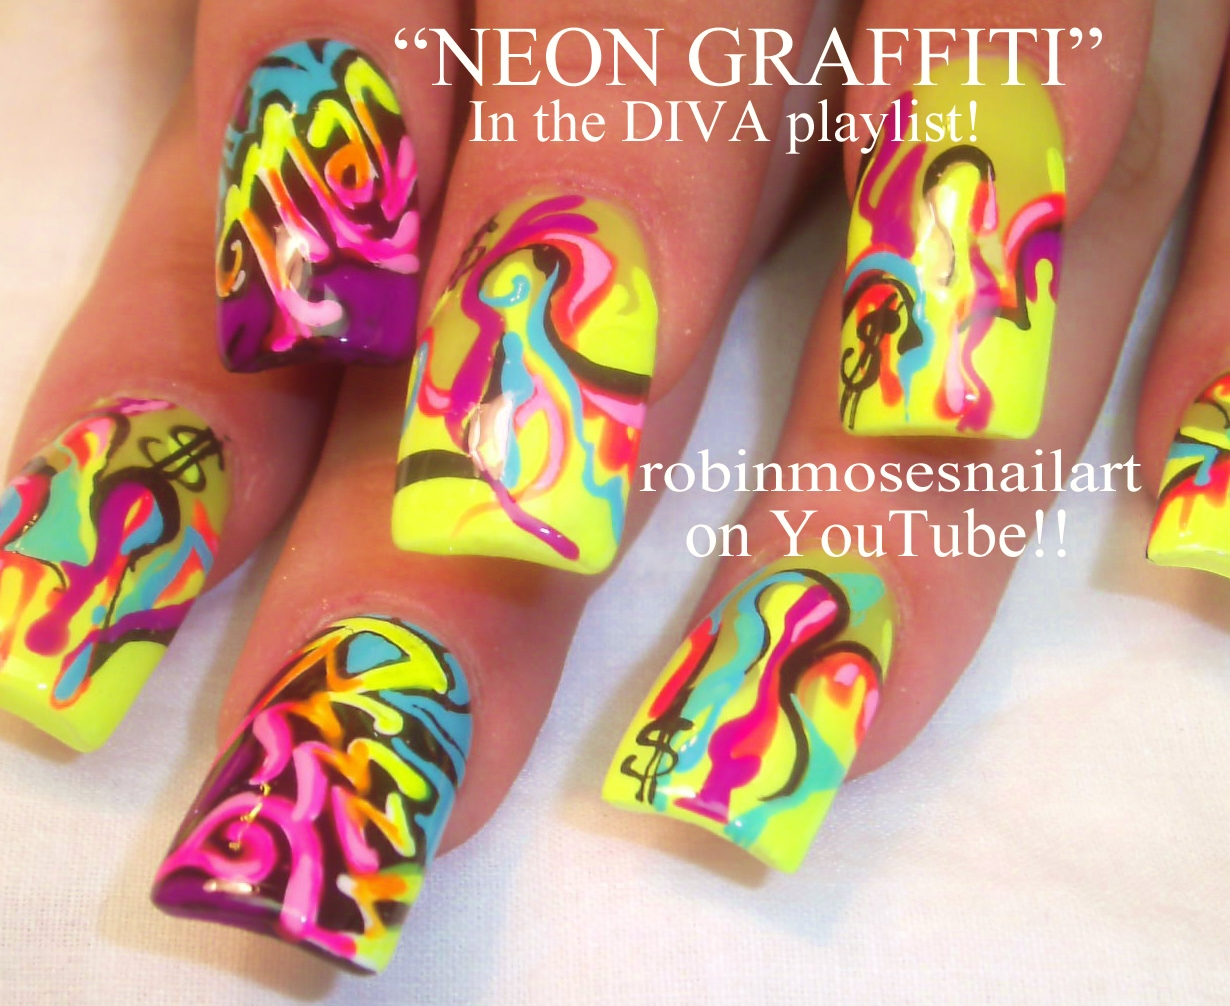 Do it yourself nail art minis rainbow brights crayola crayon nail view images robin moses nail art solutioingenieria Images